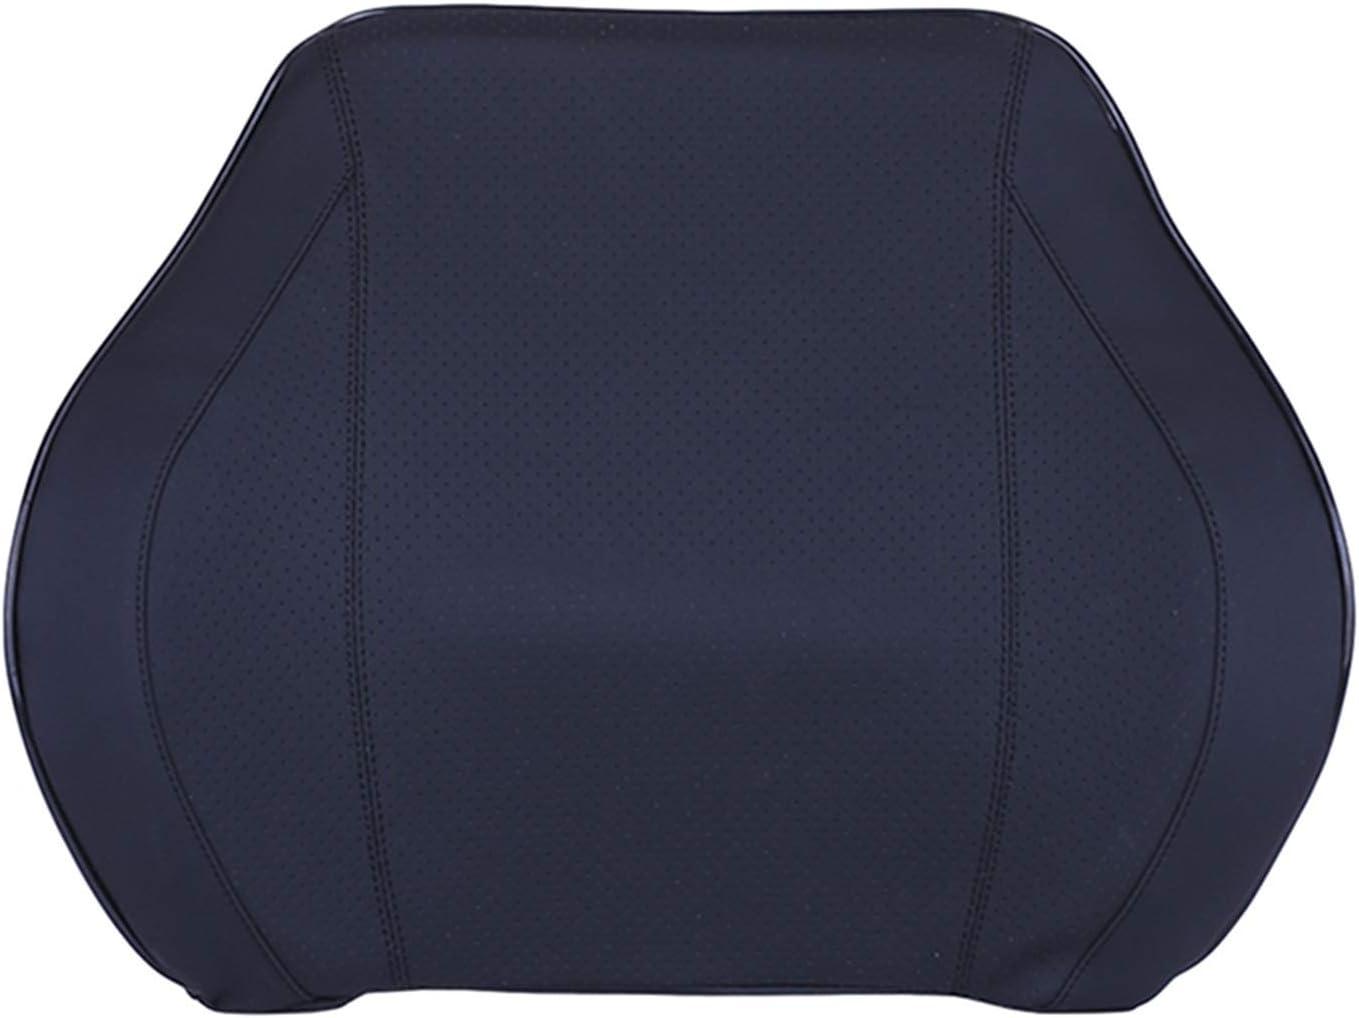 LDSSM Car Seat Head Sacramento Mall Neck Rest Memory Space Massage Pillow Cheap super special price N Auto